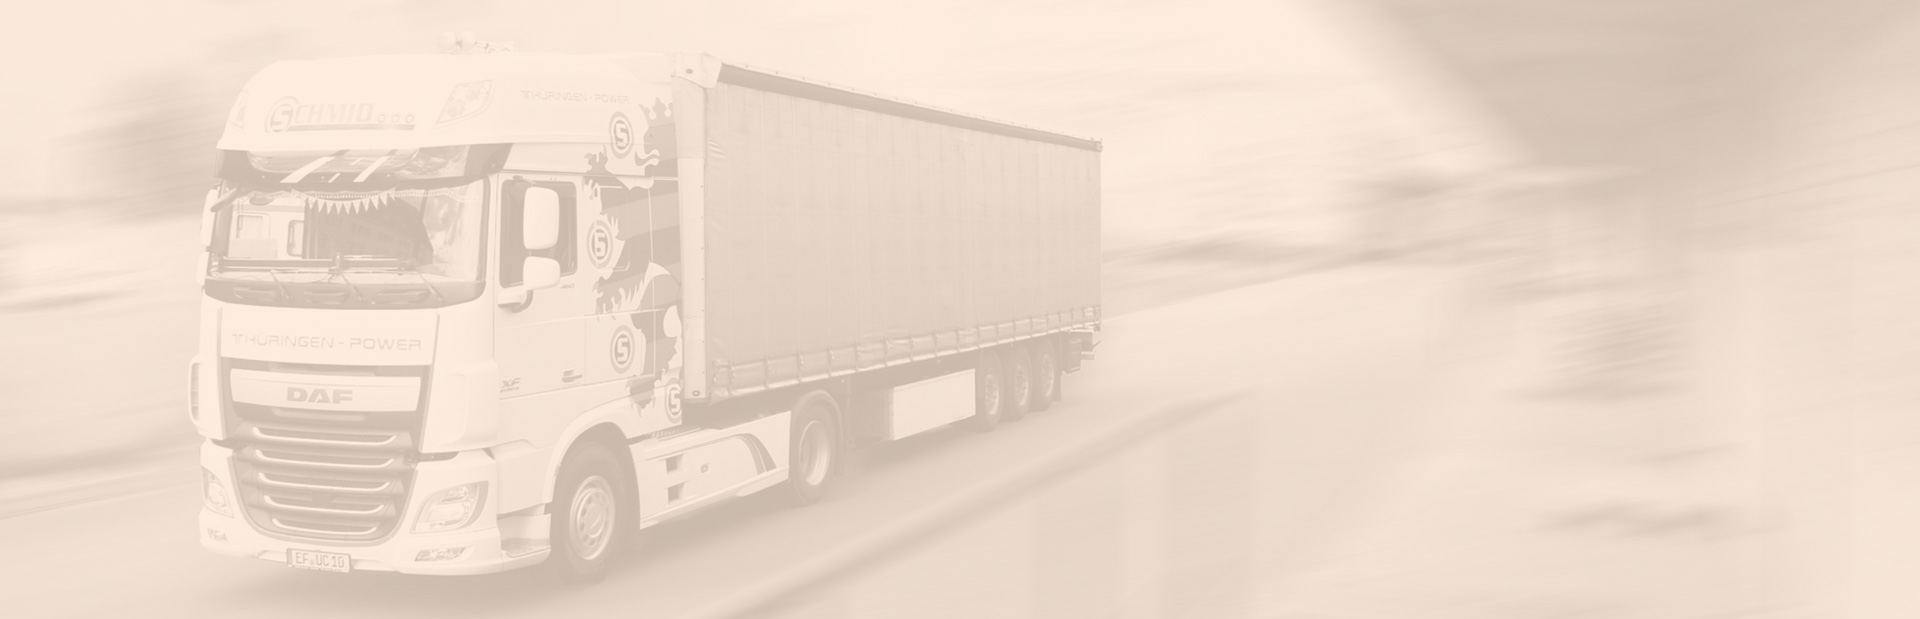 Spedition Schmid Erfurt Thüringen transport unternehmen